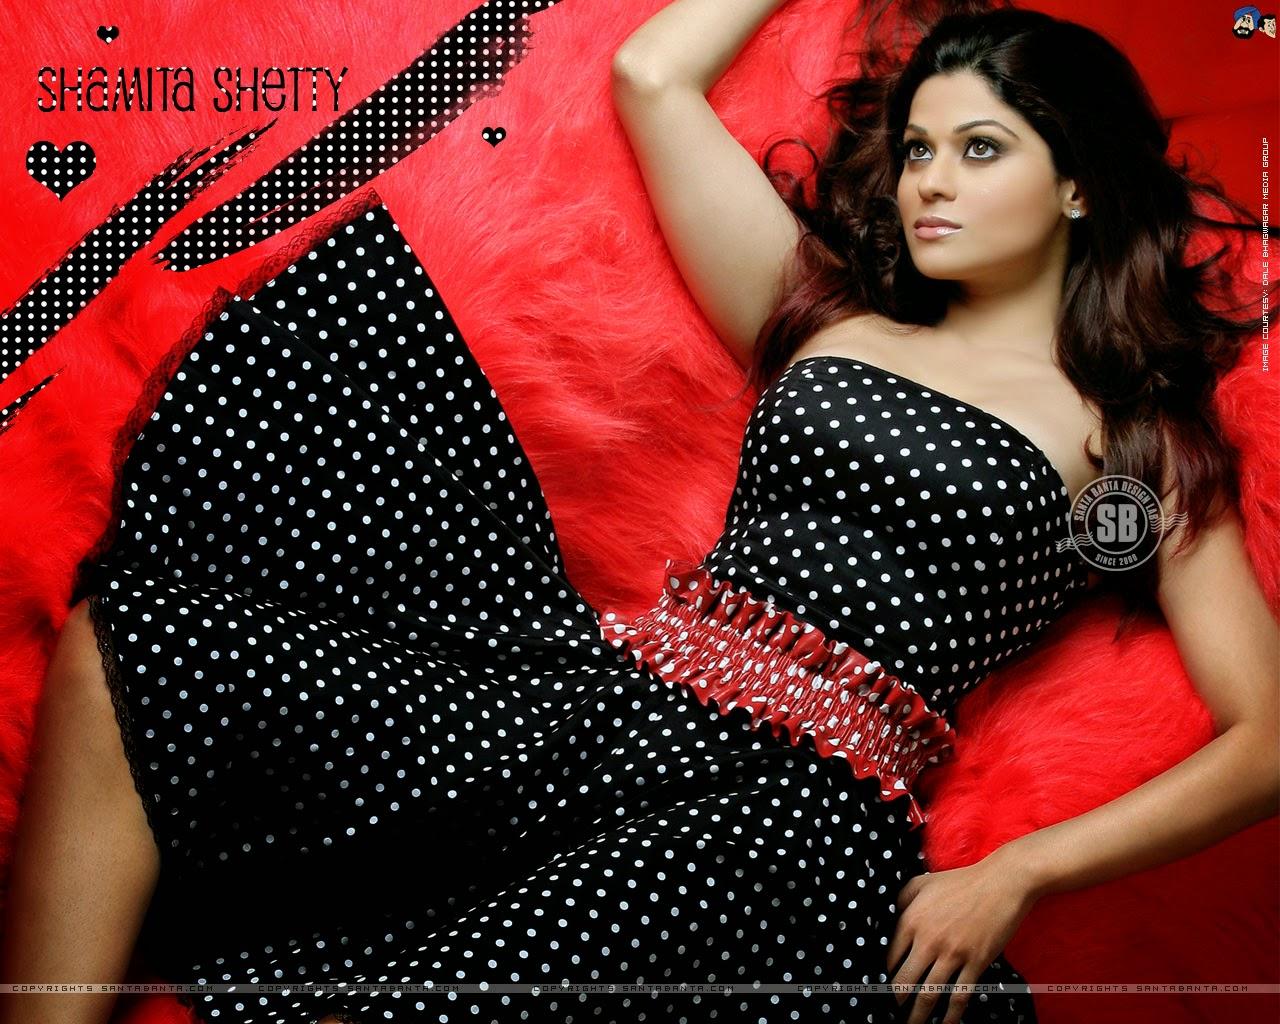 Koleksi Foto Shamita Shetty Terseksi 12